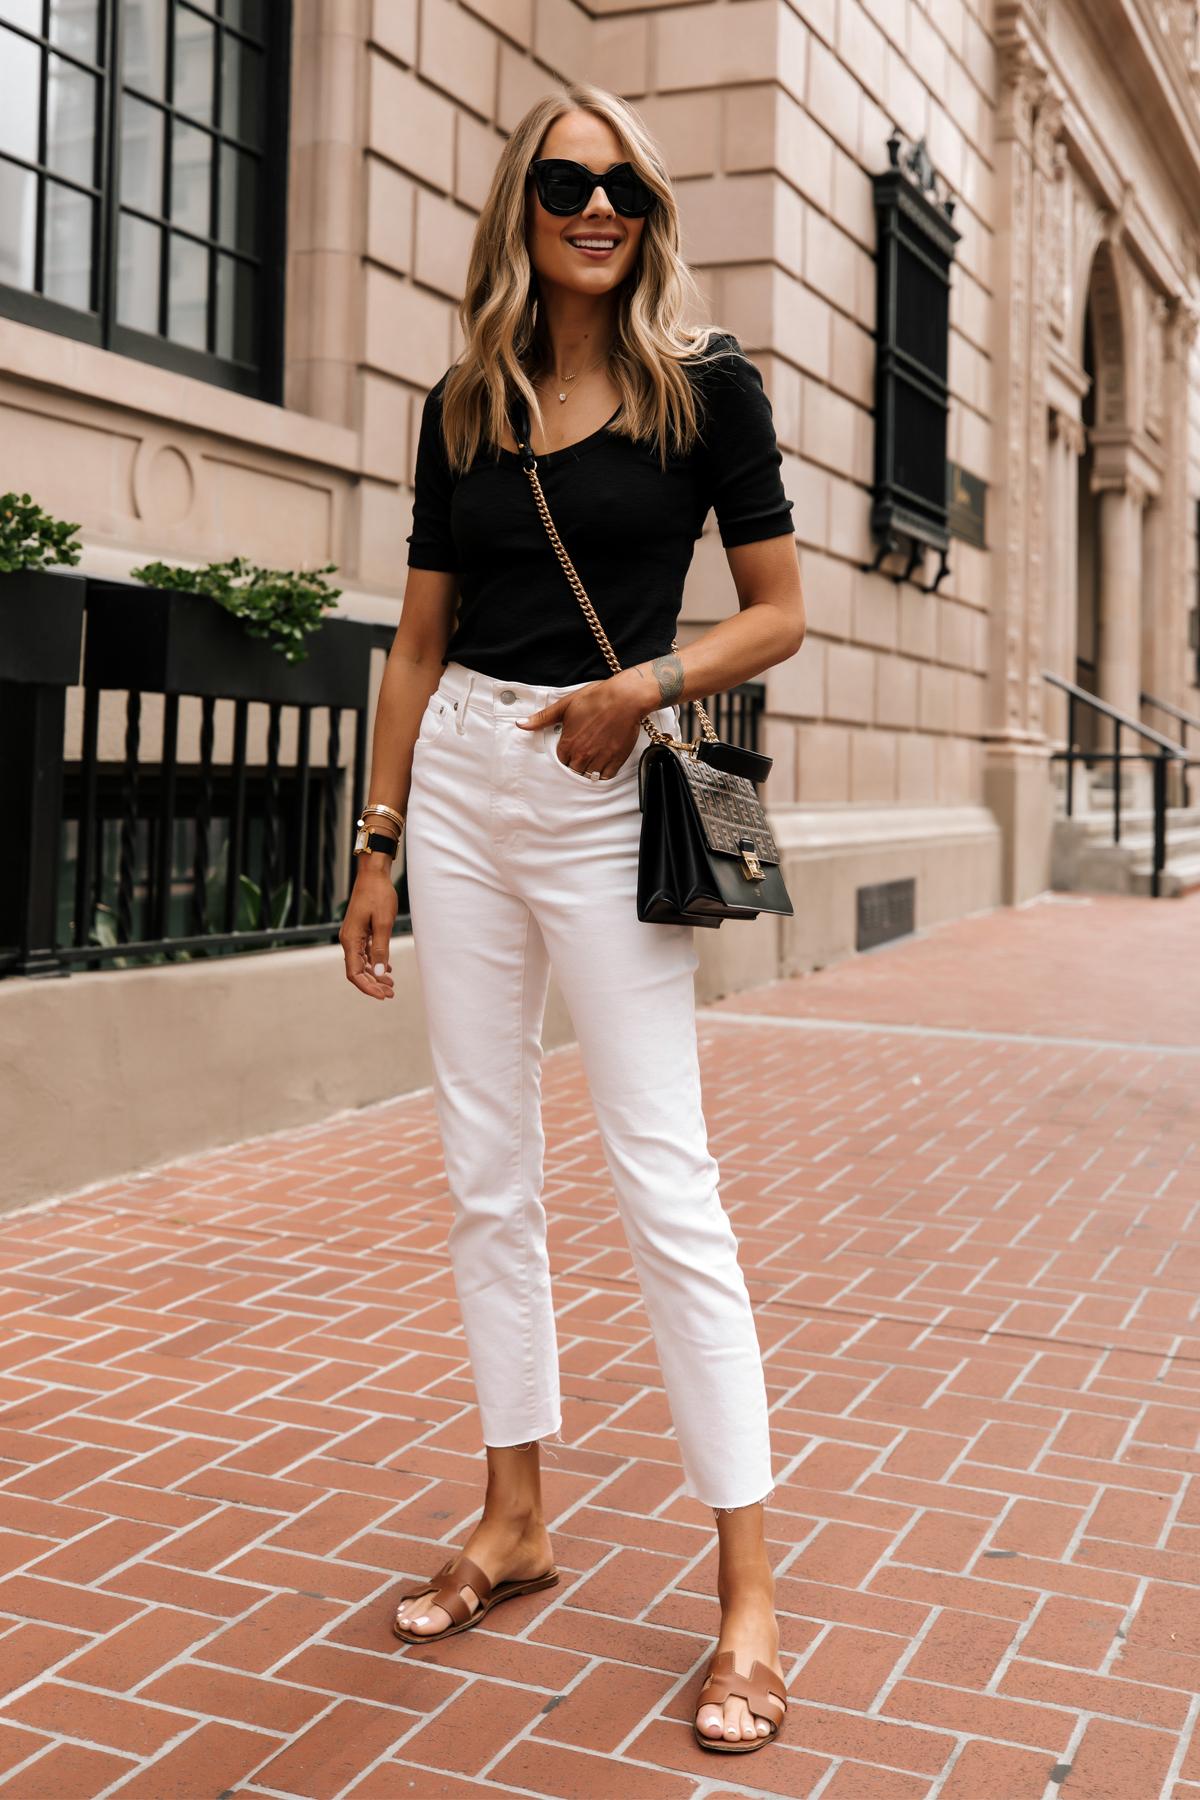 Fashion Jackson Wearing Black Scoop Neck Top White Jeans Fendi Ken U Medium Shoulder Bag Hermes Oran Tan Sandals white jeans summer outfit 1